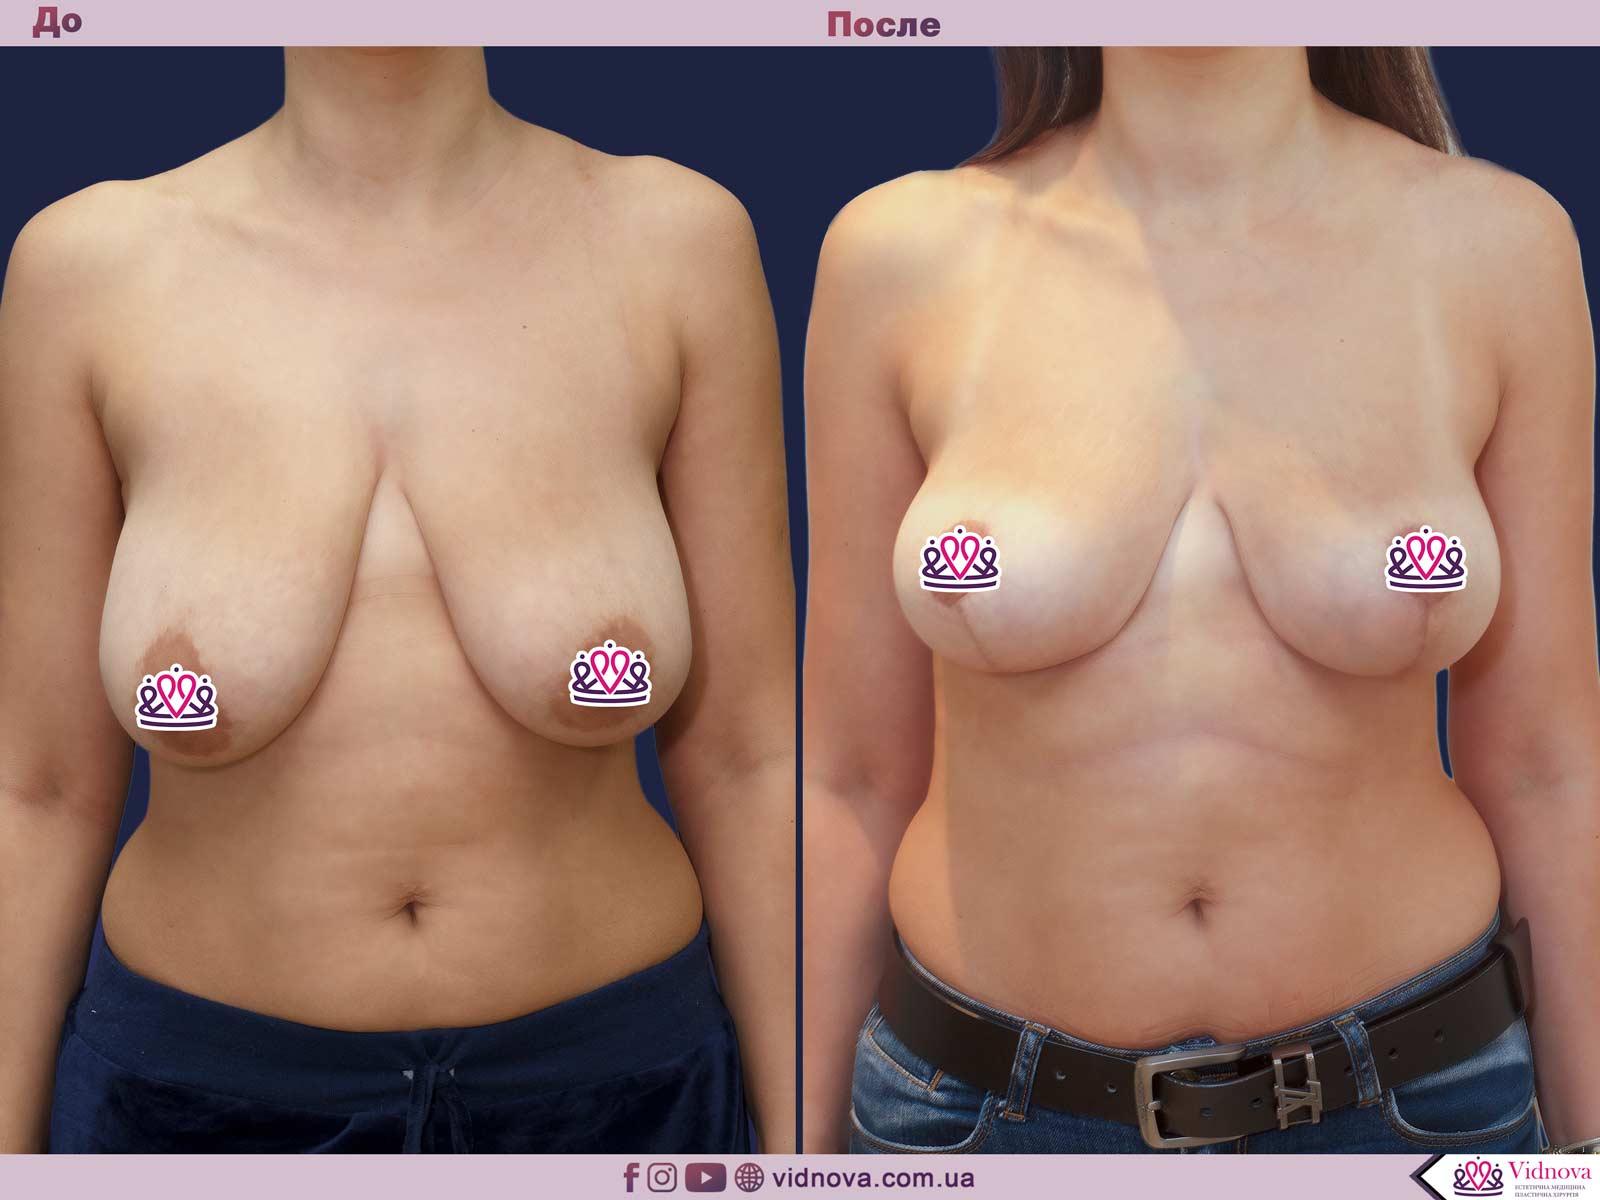 Подтяжка груди: Фото ДО и ПОСЛЕ - Пример №24-1 - Клиника Vidnova